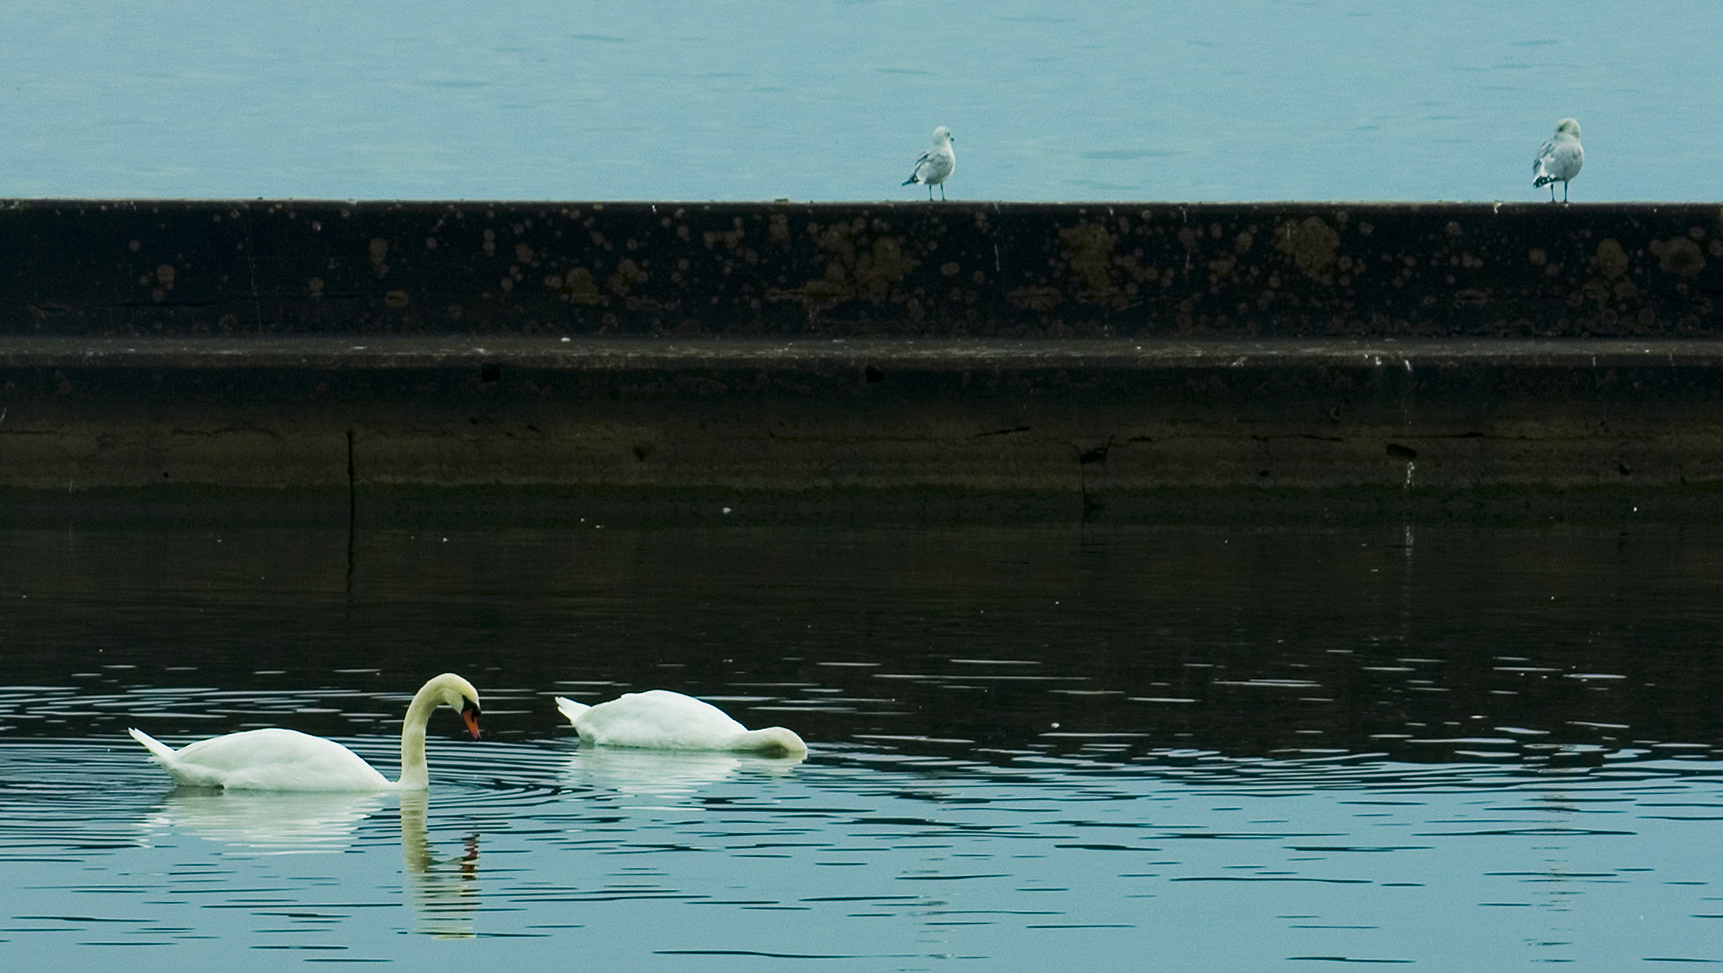 WATERBIRDS AT LAKE ONTARIO